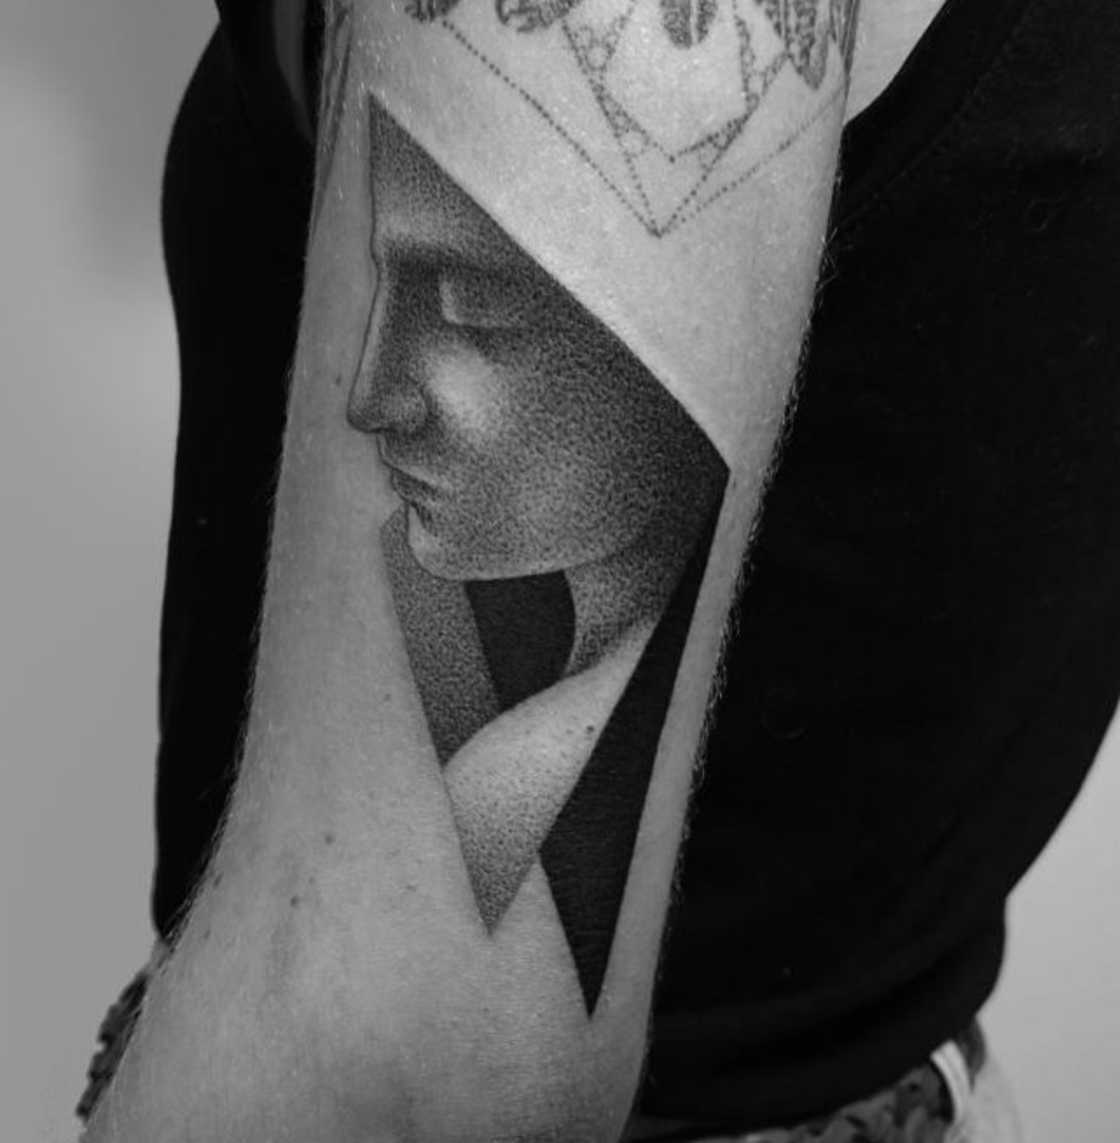 dotyk-dotwork-tattoo-21